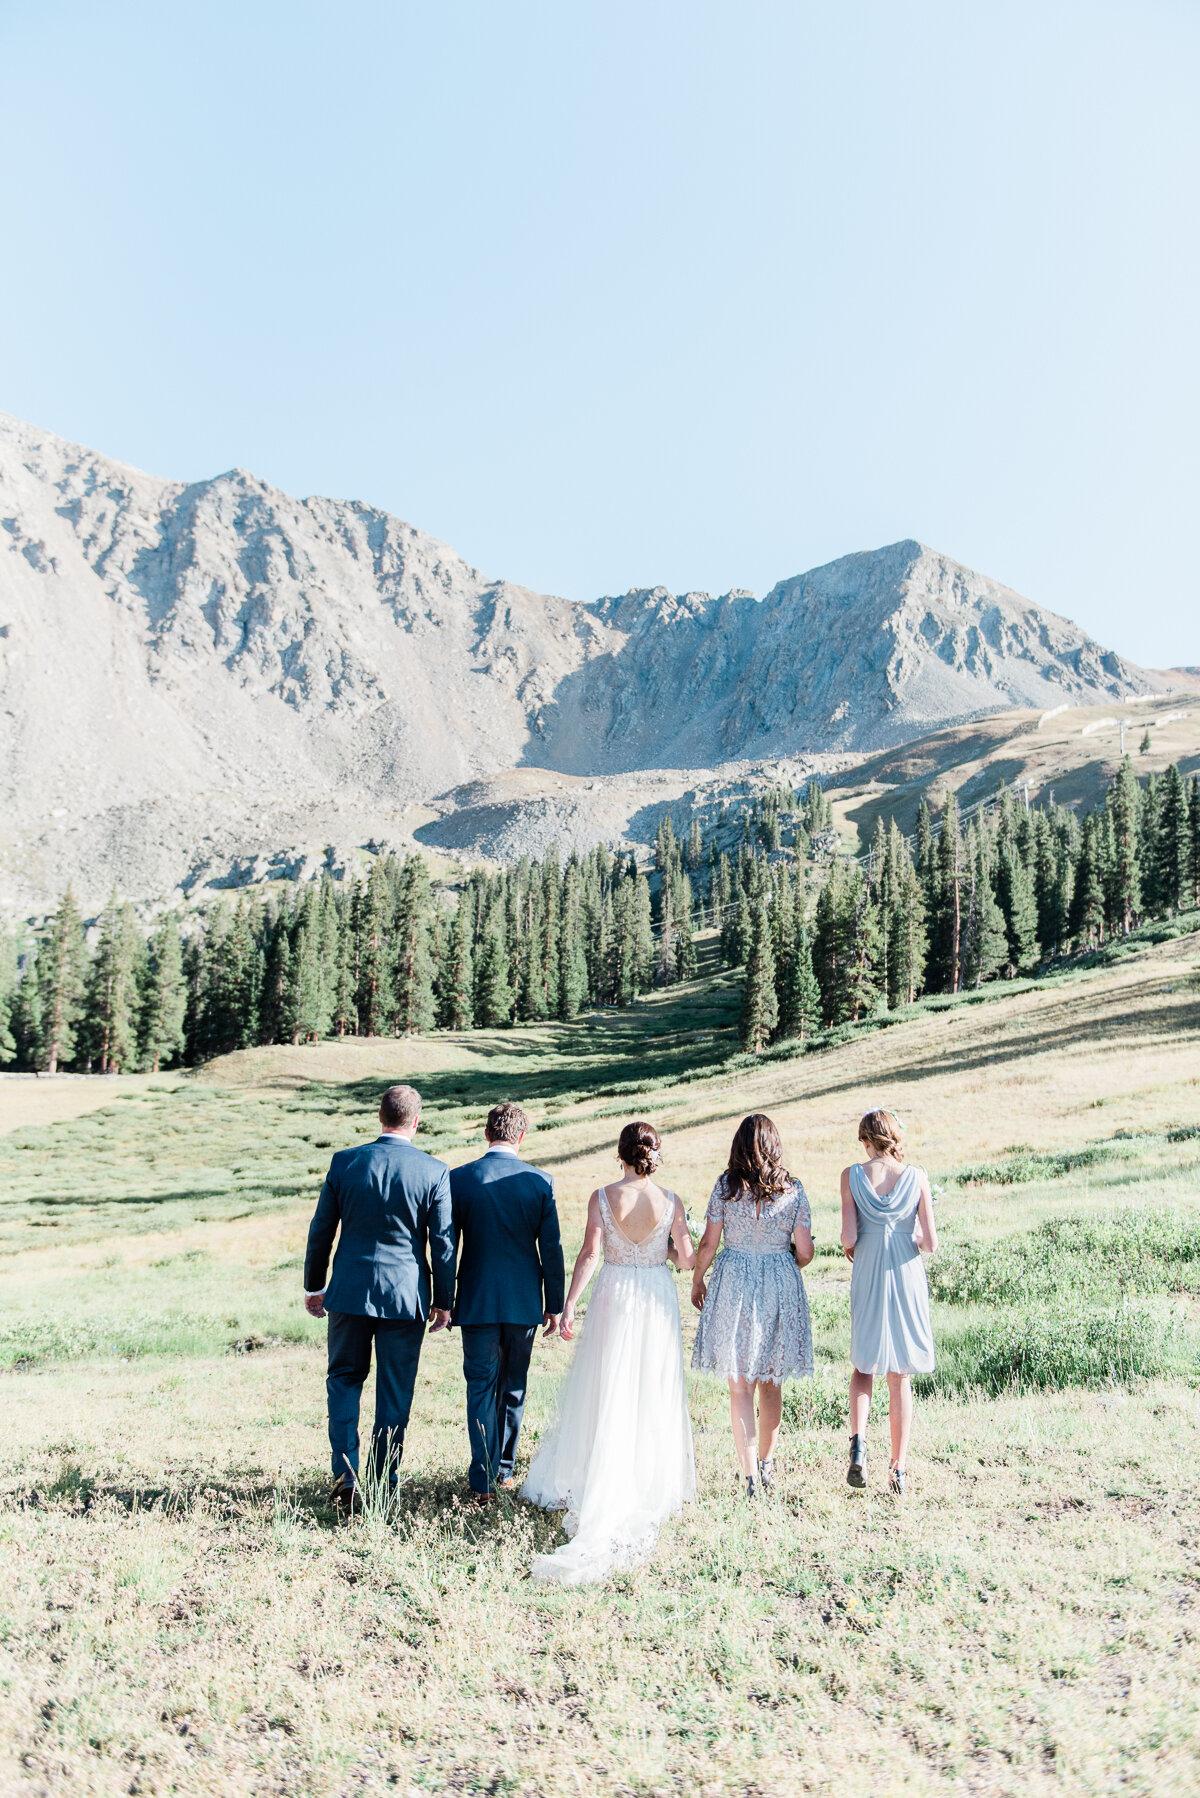 AshleighMillerPhotography-Wedding-Natalia-Matt-ArapahoeBasin-Colorado-32.jpg